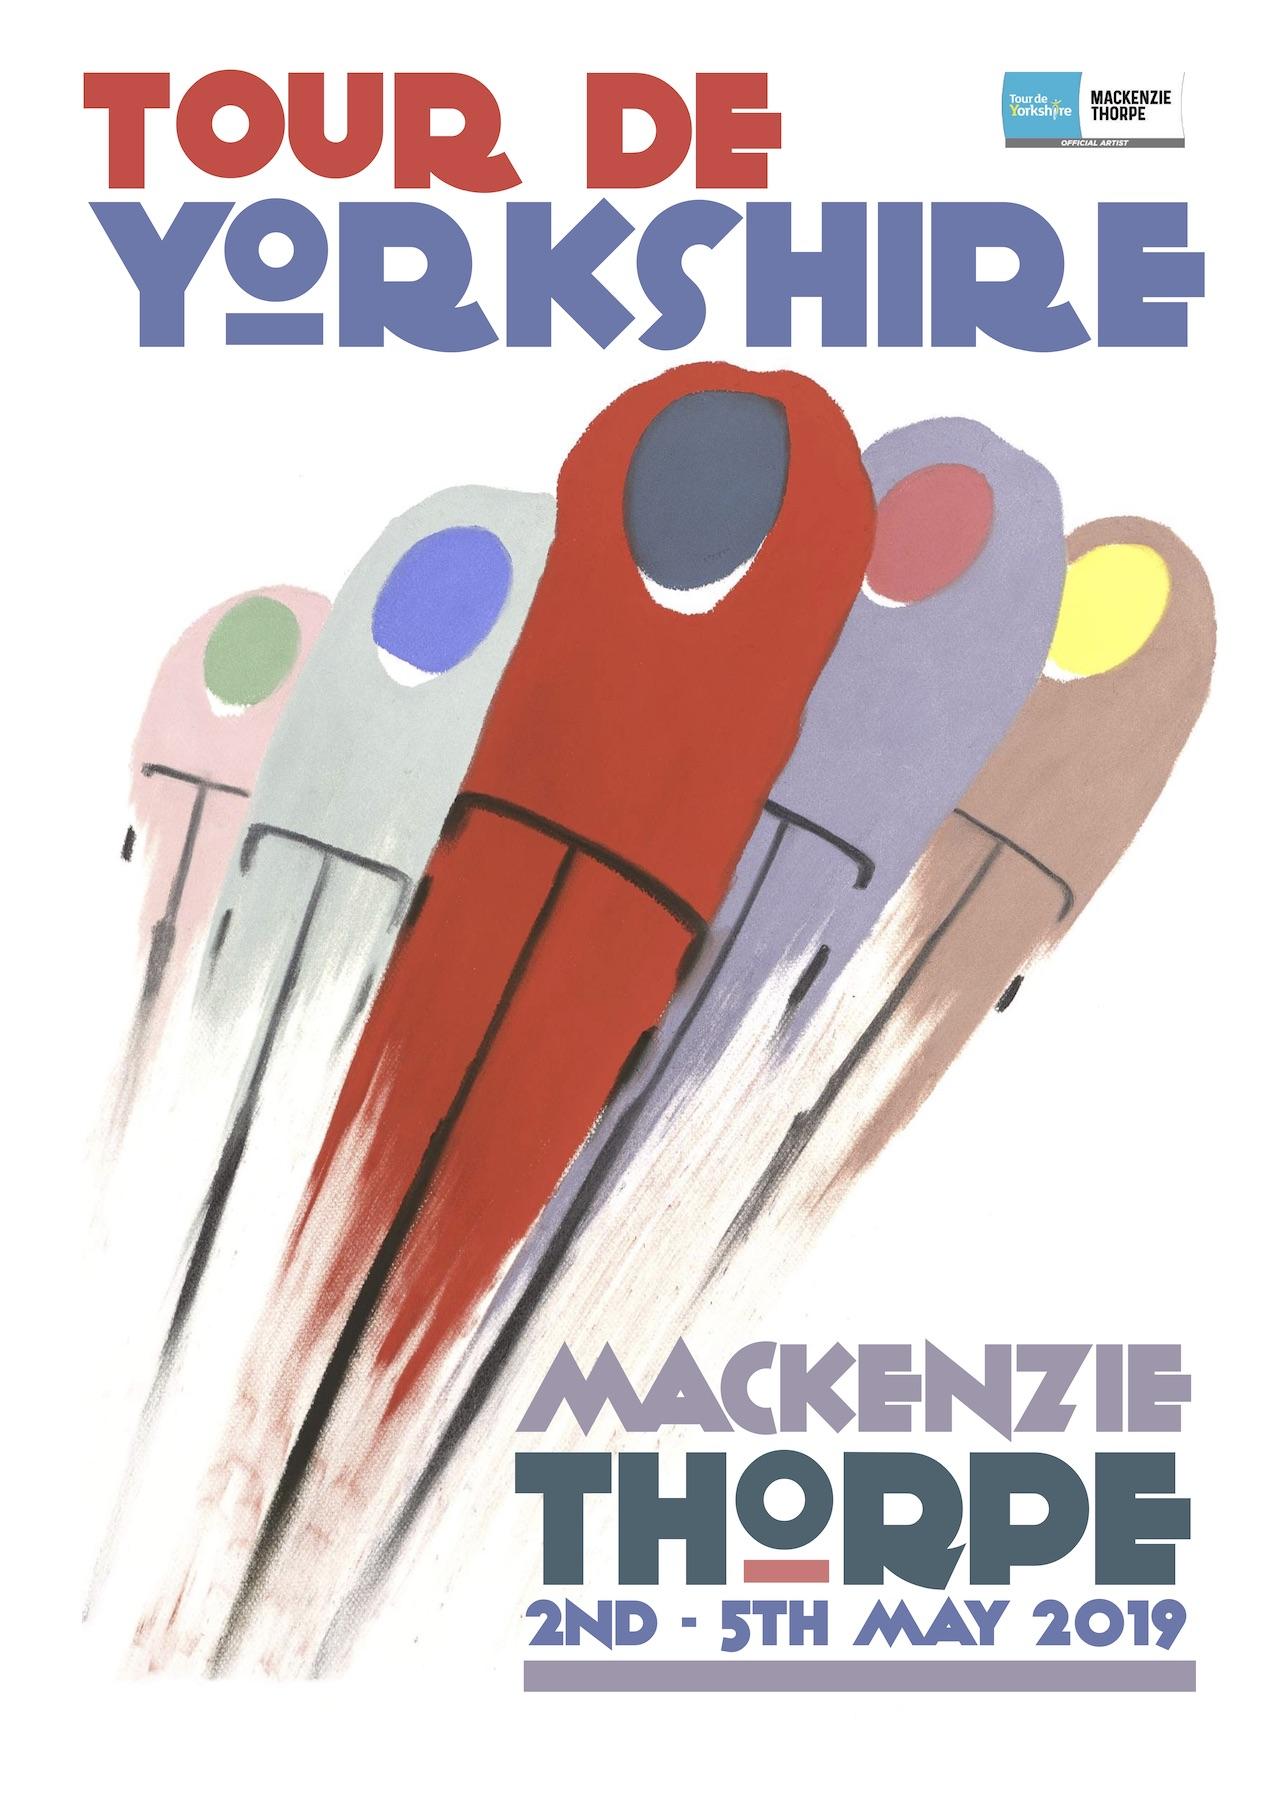 Round The Bend artwork from Mackenzie Thorpe